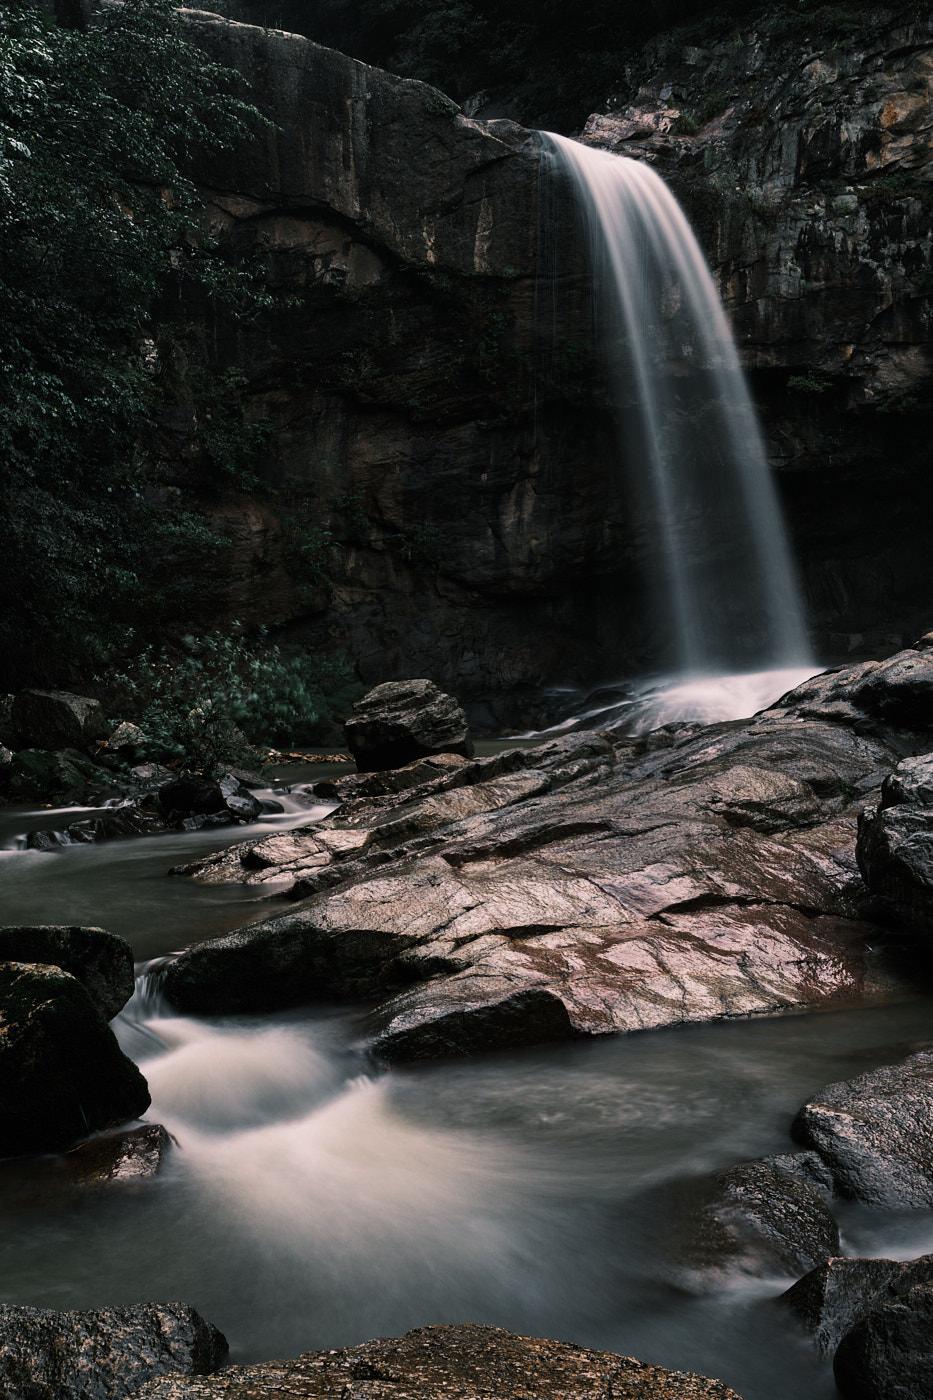 Hapcheon Waterfall